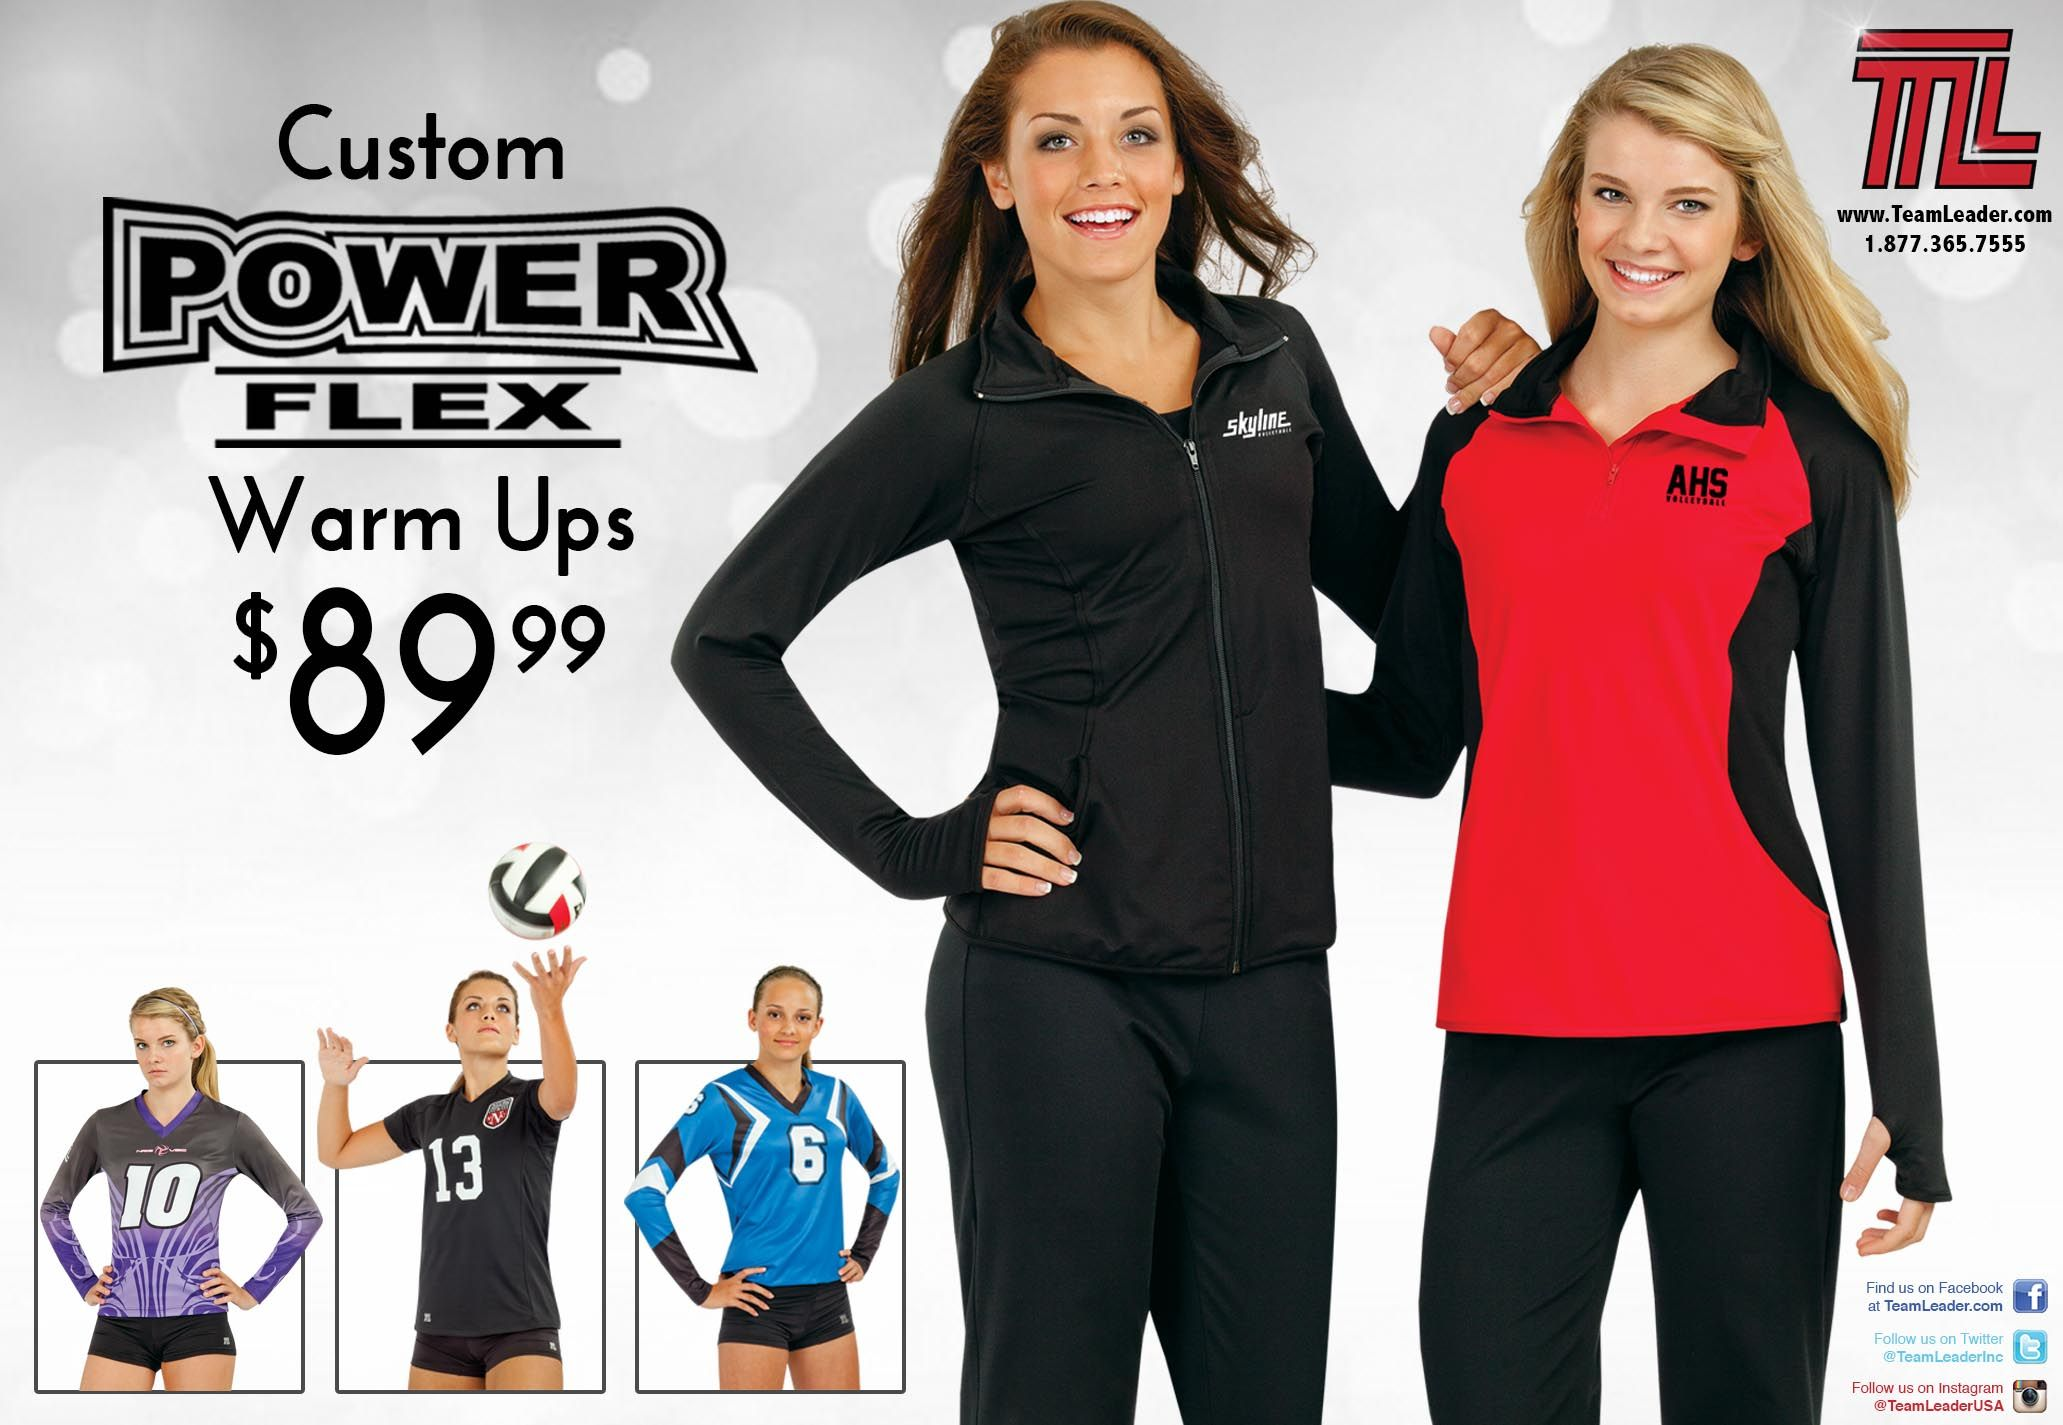 Powerflex Warmups And Custom Jerseys Volleyball Uniforms Swimwear Wetsuit